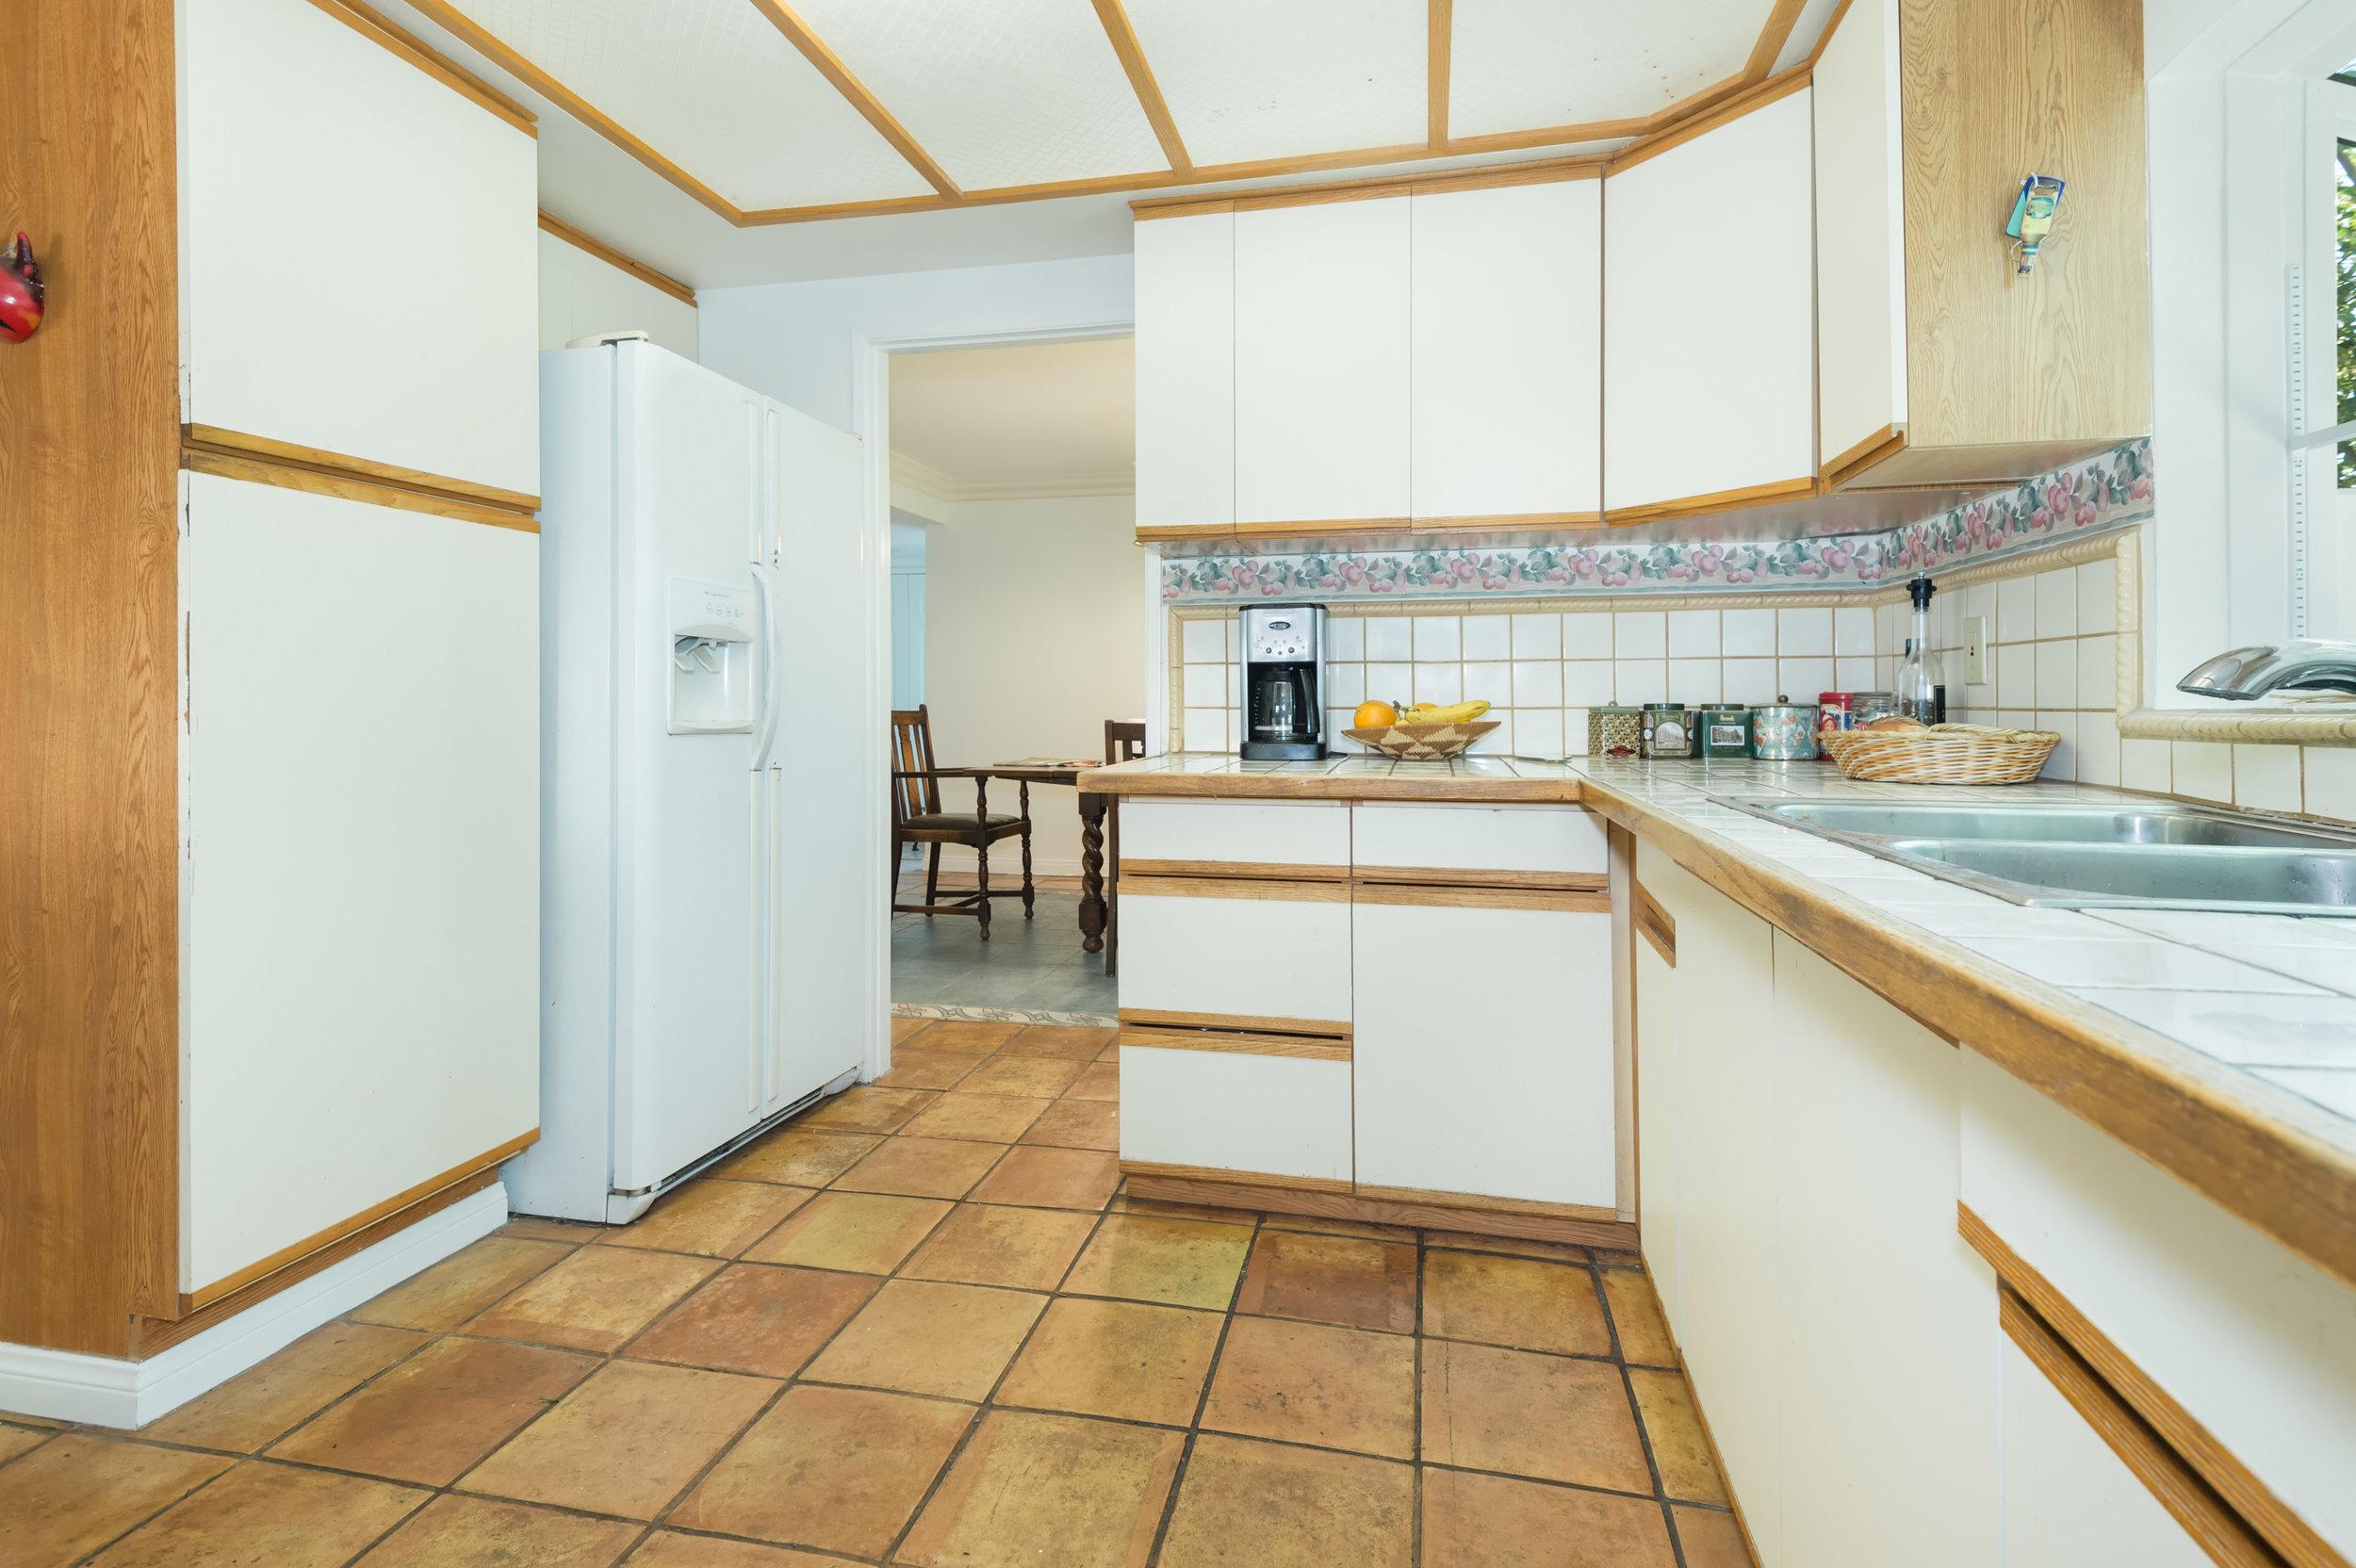 023 Kitchen 15072 Rayneta Sherman Oaks For Sale The Malibu Life Team Luxury Real Estate.jpg